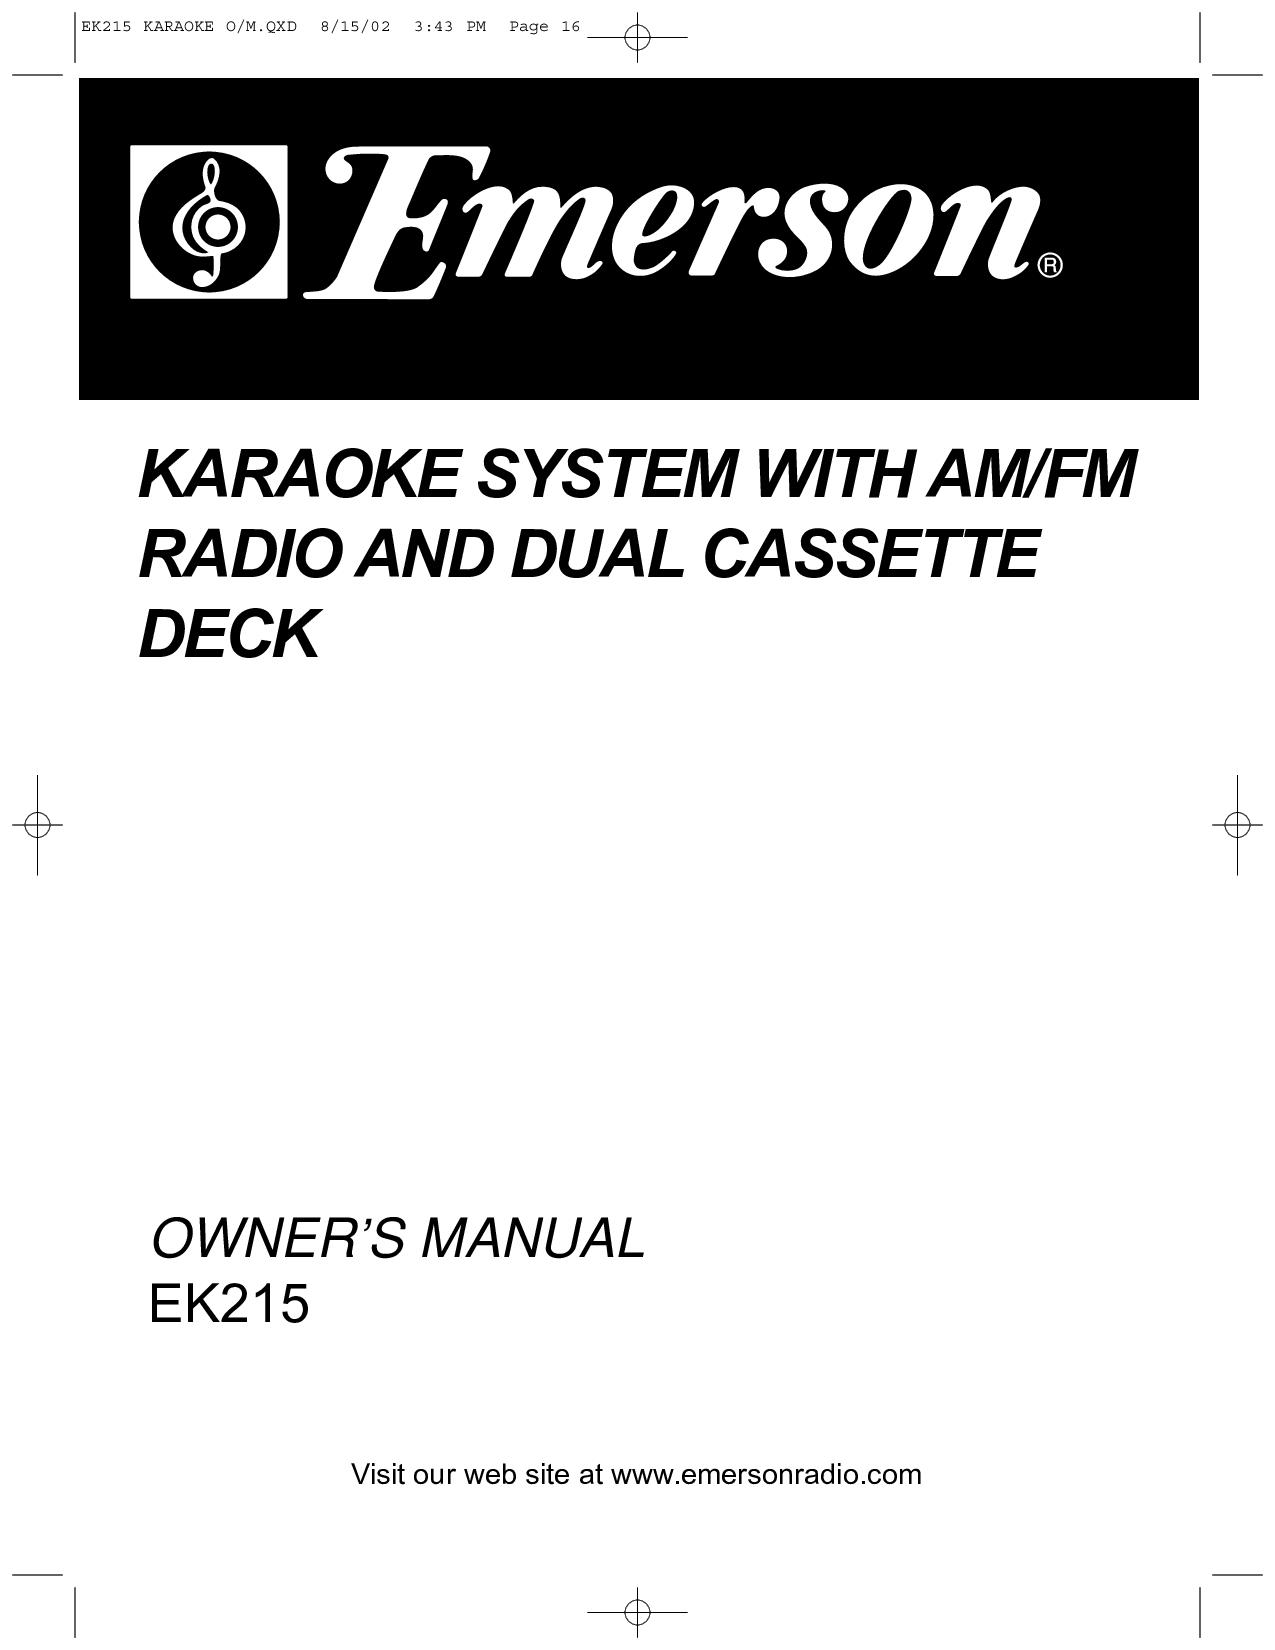 Emerson Home Audio manuals